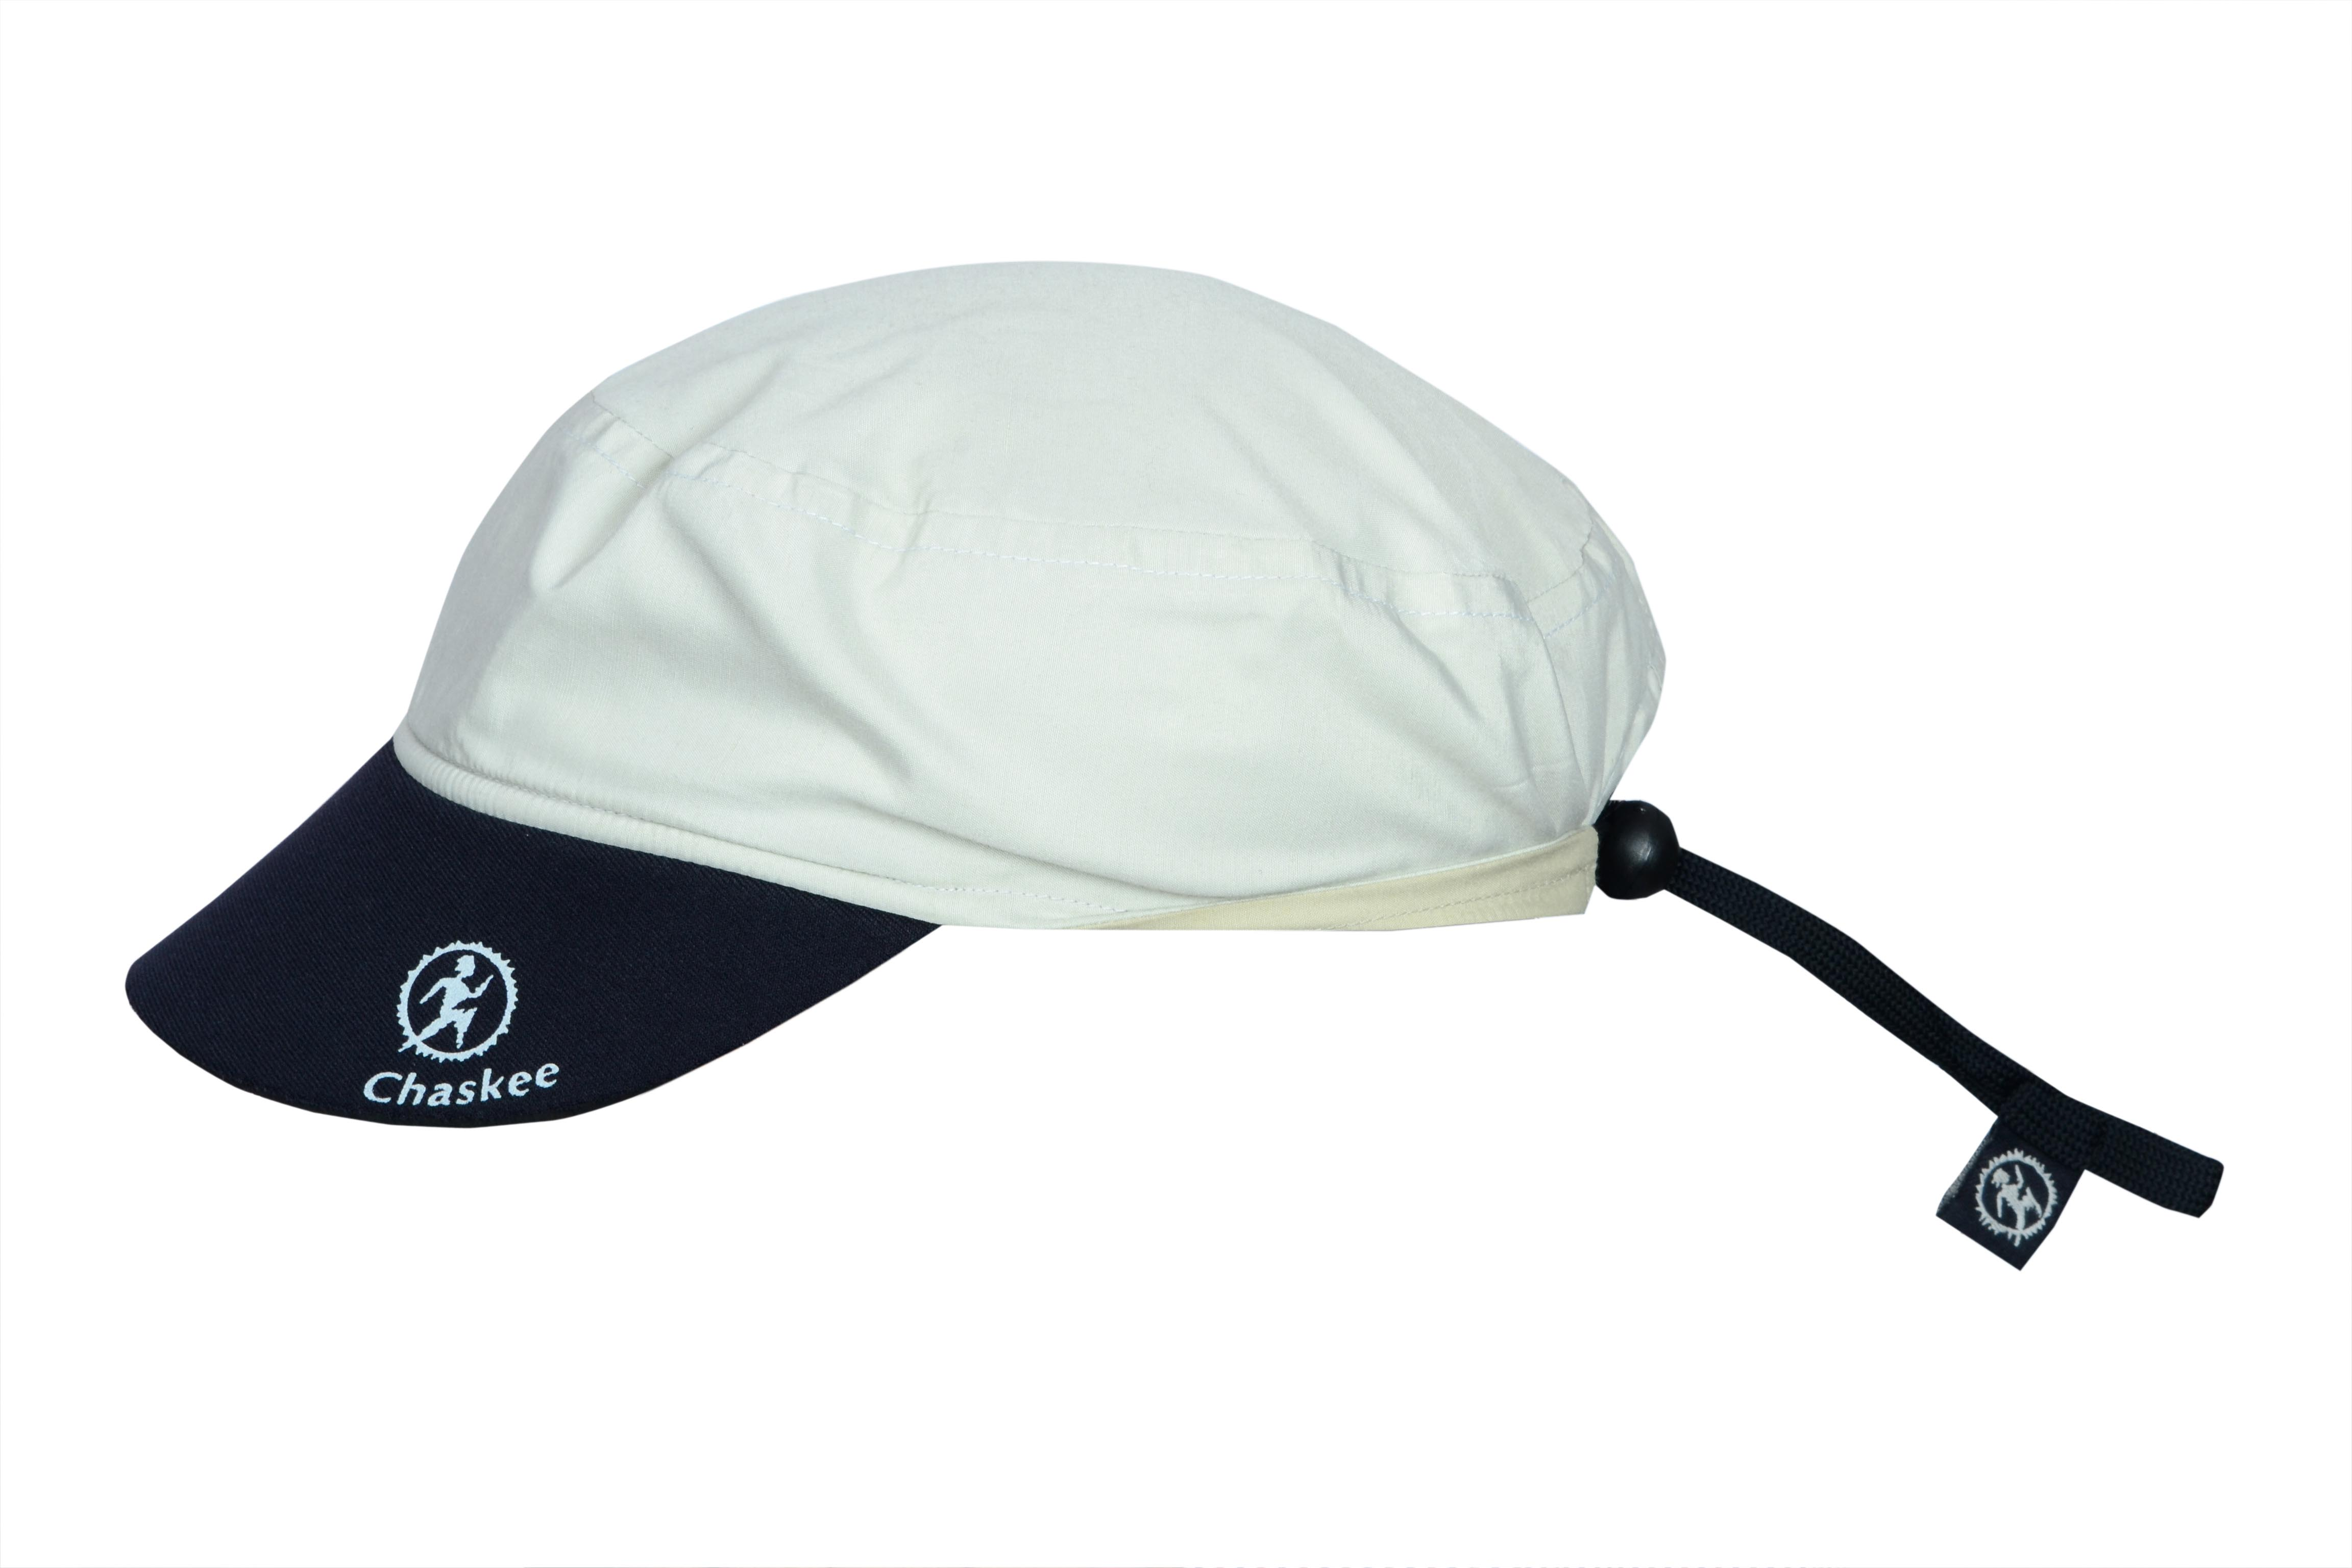 251e1c25336 Style 001 – MF Reversible Cap plain Microfiber (2 panel) – Mid-size visor –  Lining extra plain color – One size fits all